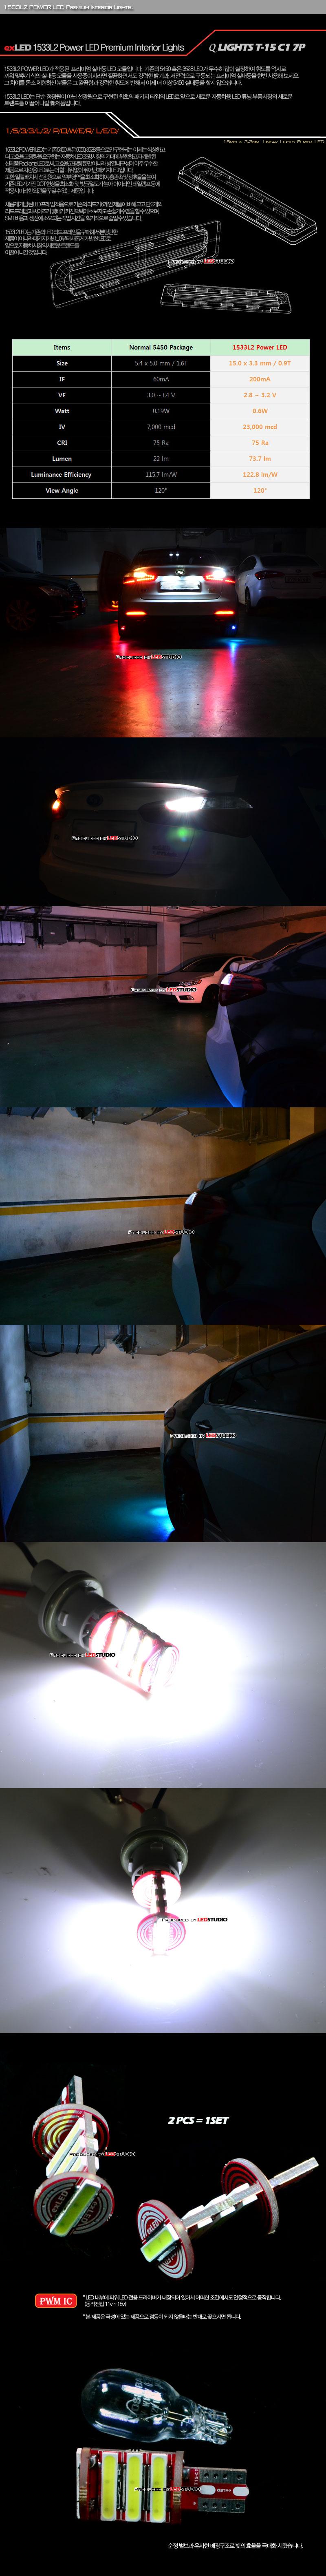 exLED 1533L2파워LED Q-LIGHTS 후진등  T-15 C1 7P PWM (무저항 IC 내장형) (2개 1조)